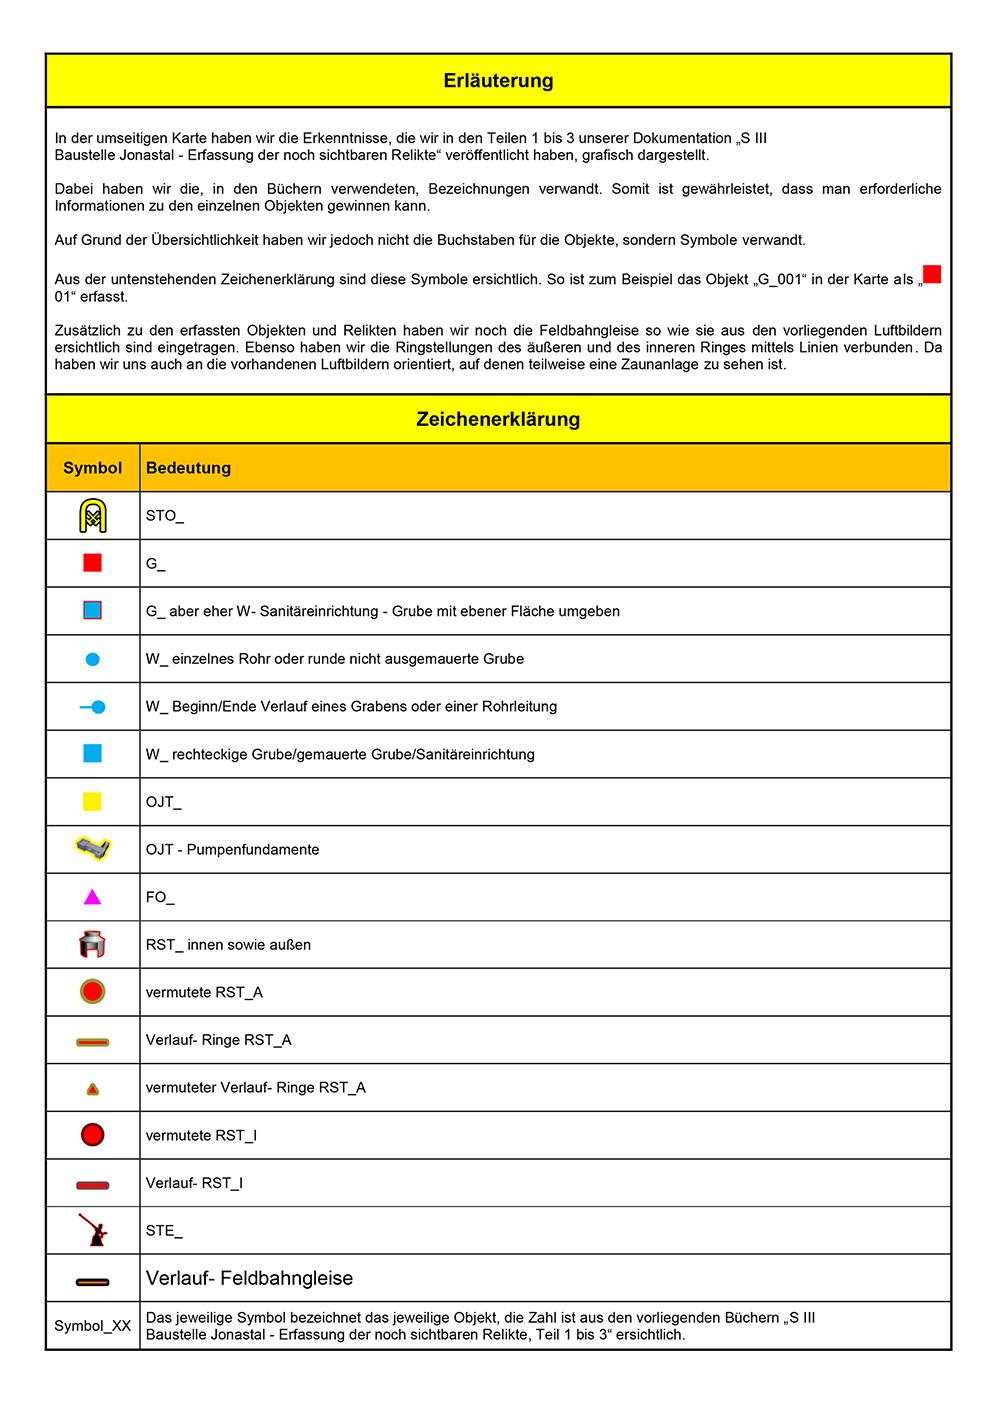 Teil IV Uebersichtskarte Baustelle S III Ausschnitt 3